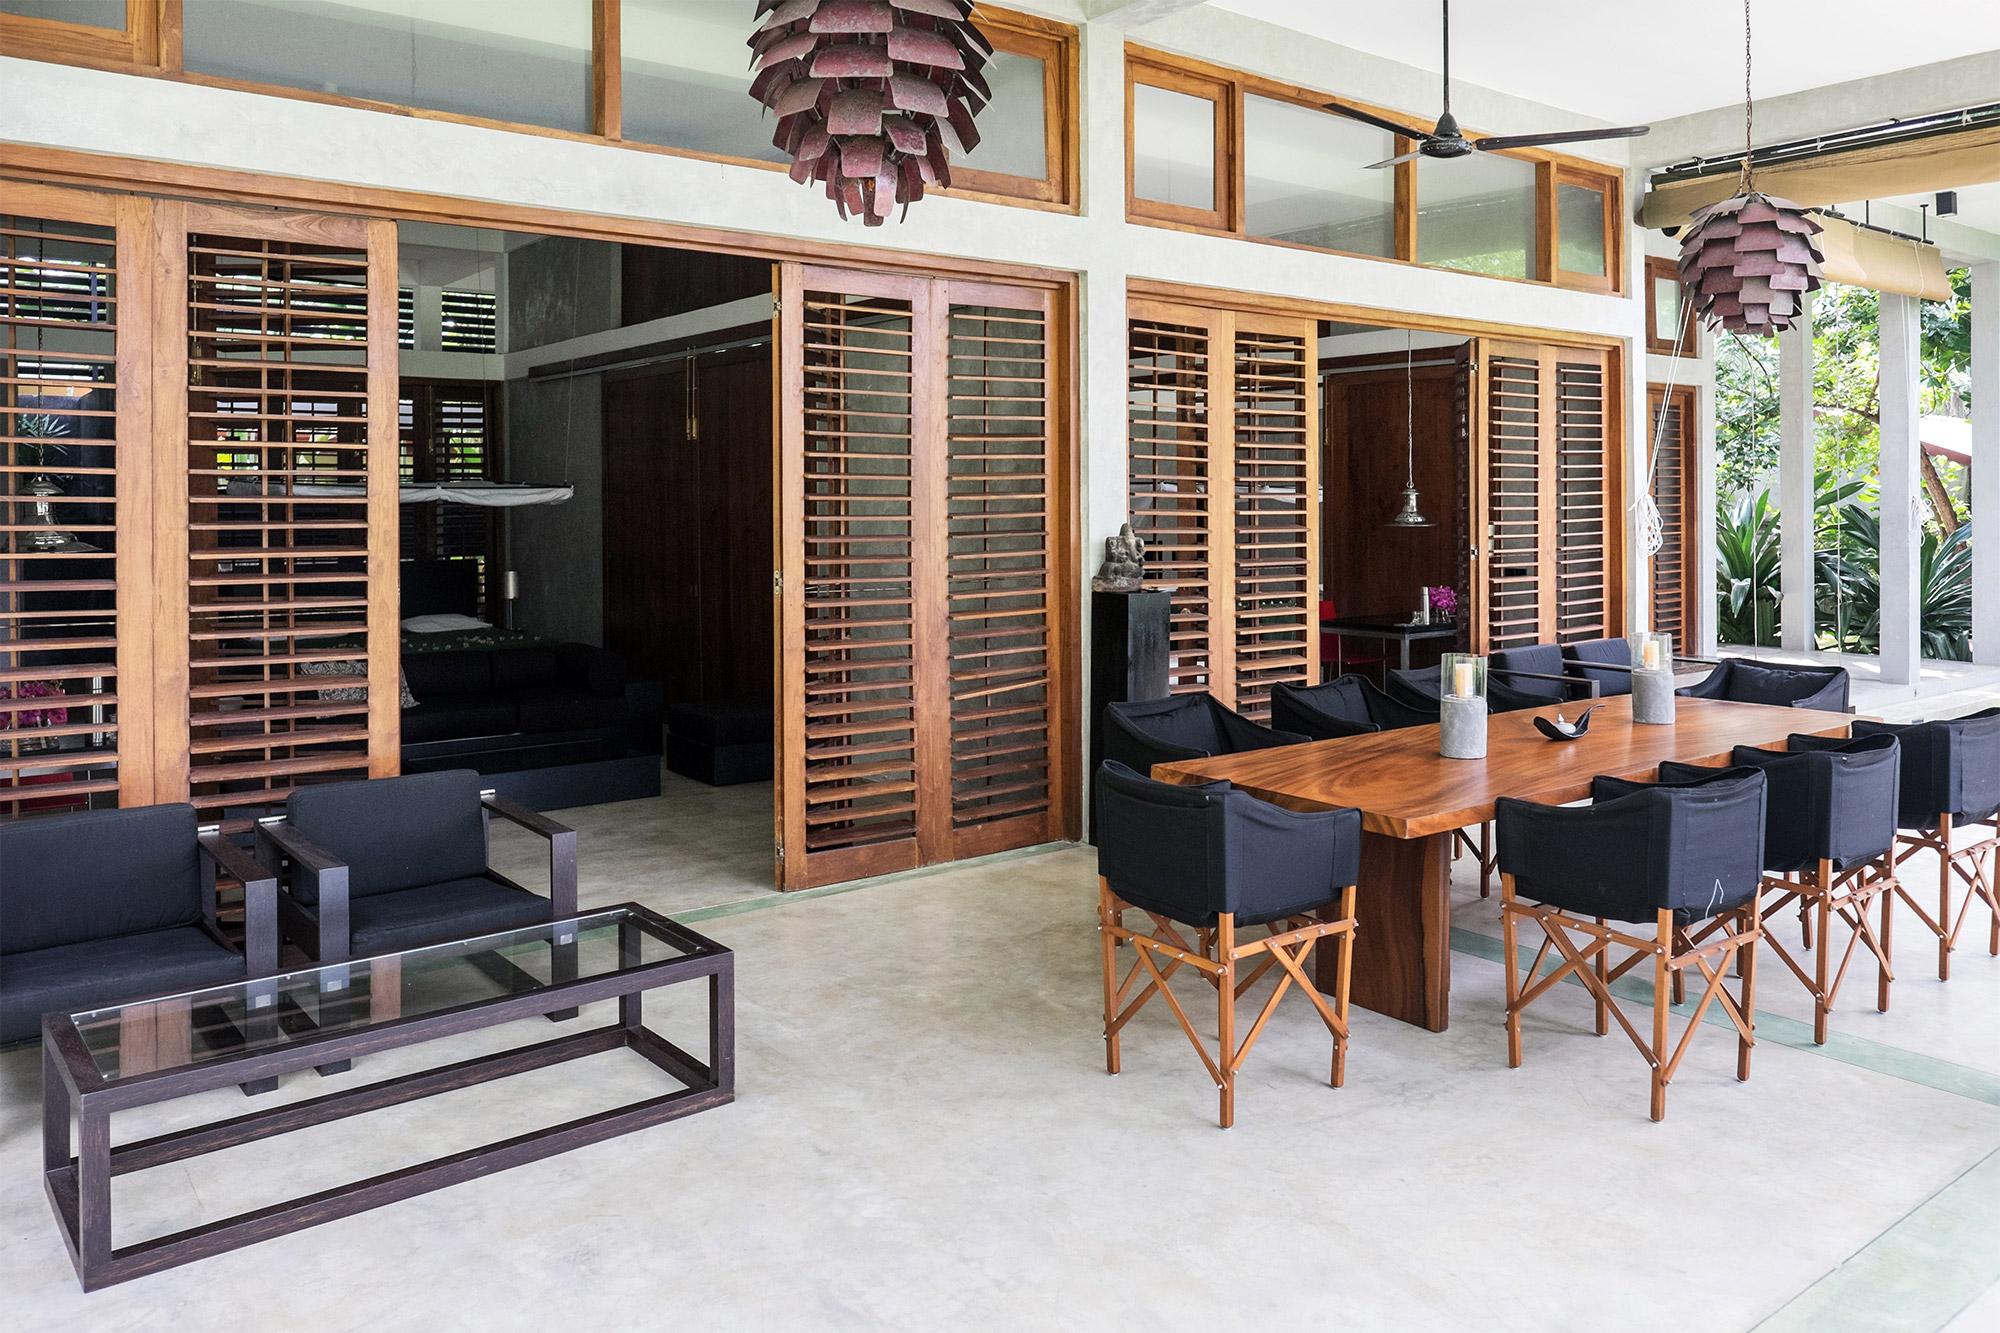 Araliya Bungalow im Ayurveda Resort der one world foundation in Ahungalla, Sri Lanka, Foto: Andrea Alessandri